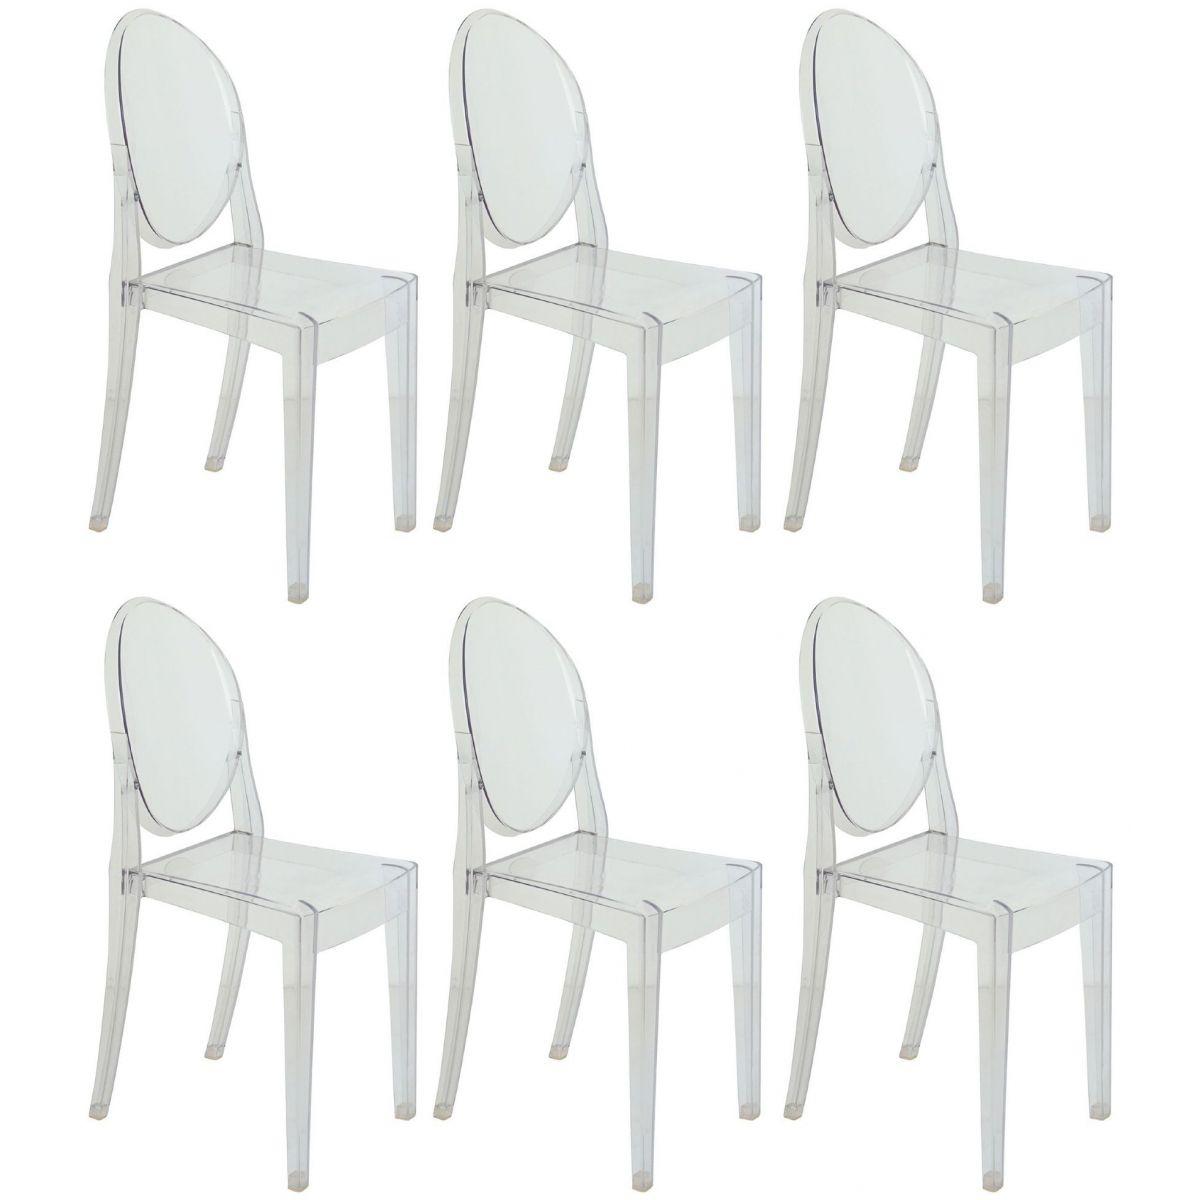 Kit 6 Cadeiras Design Victoria Ghost Pelegrin PEL-1752B Fixa - Acrílico Transparente